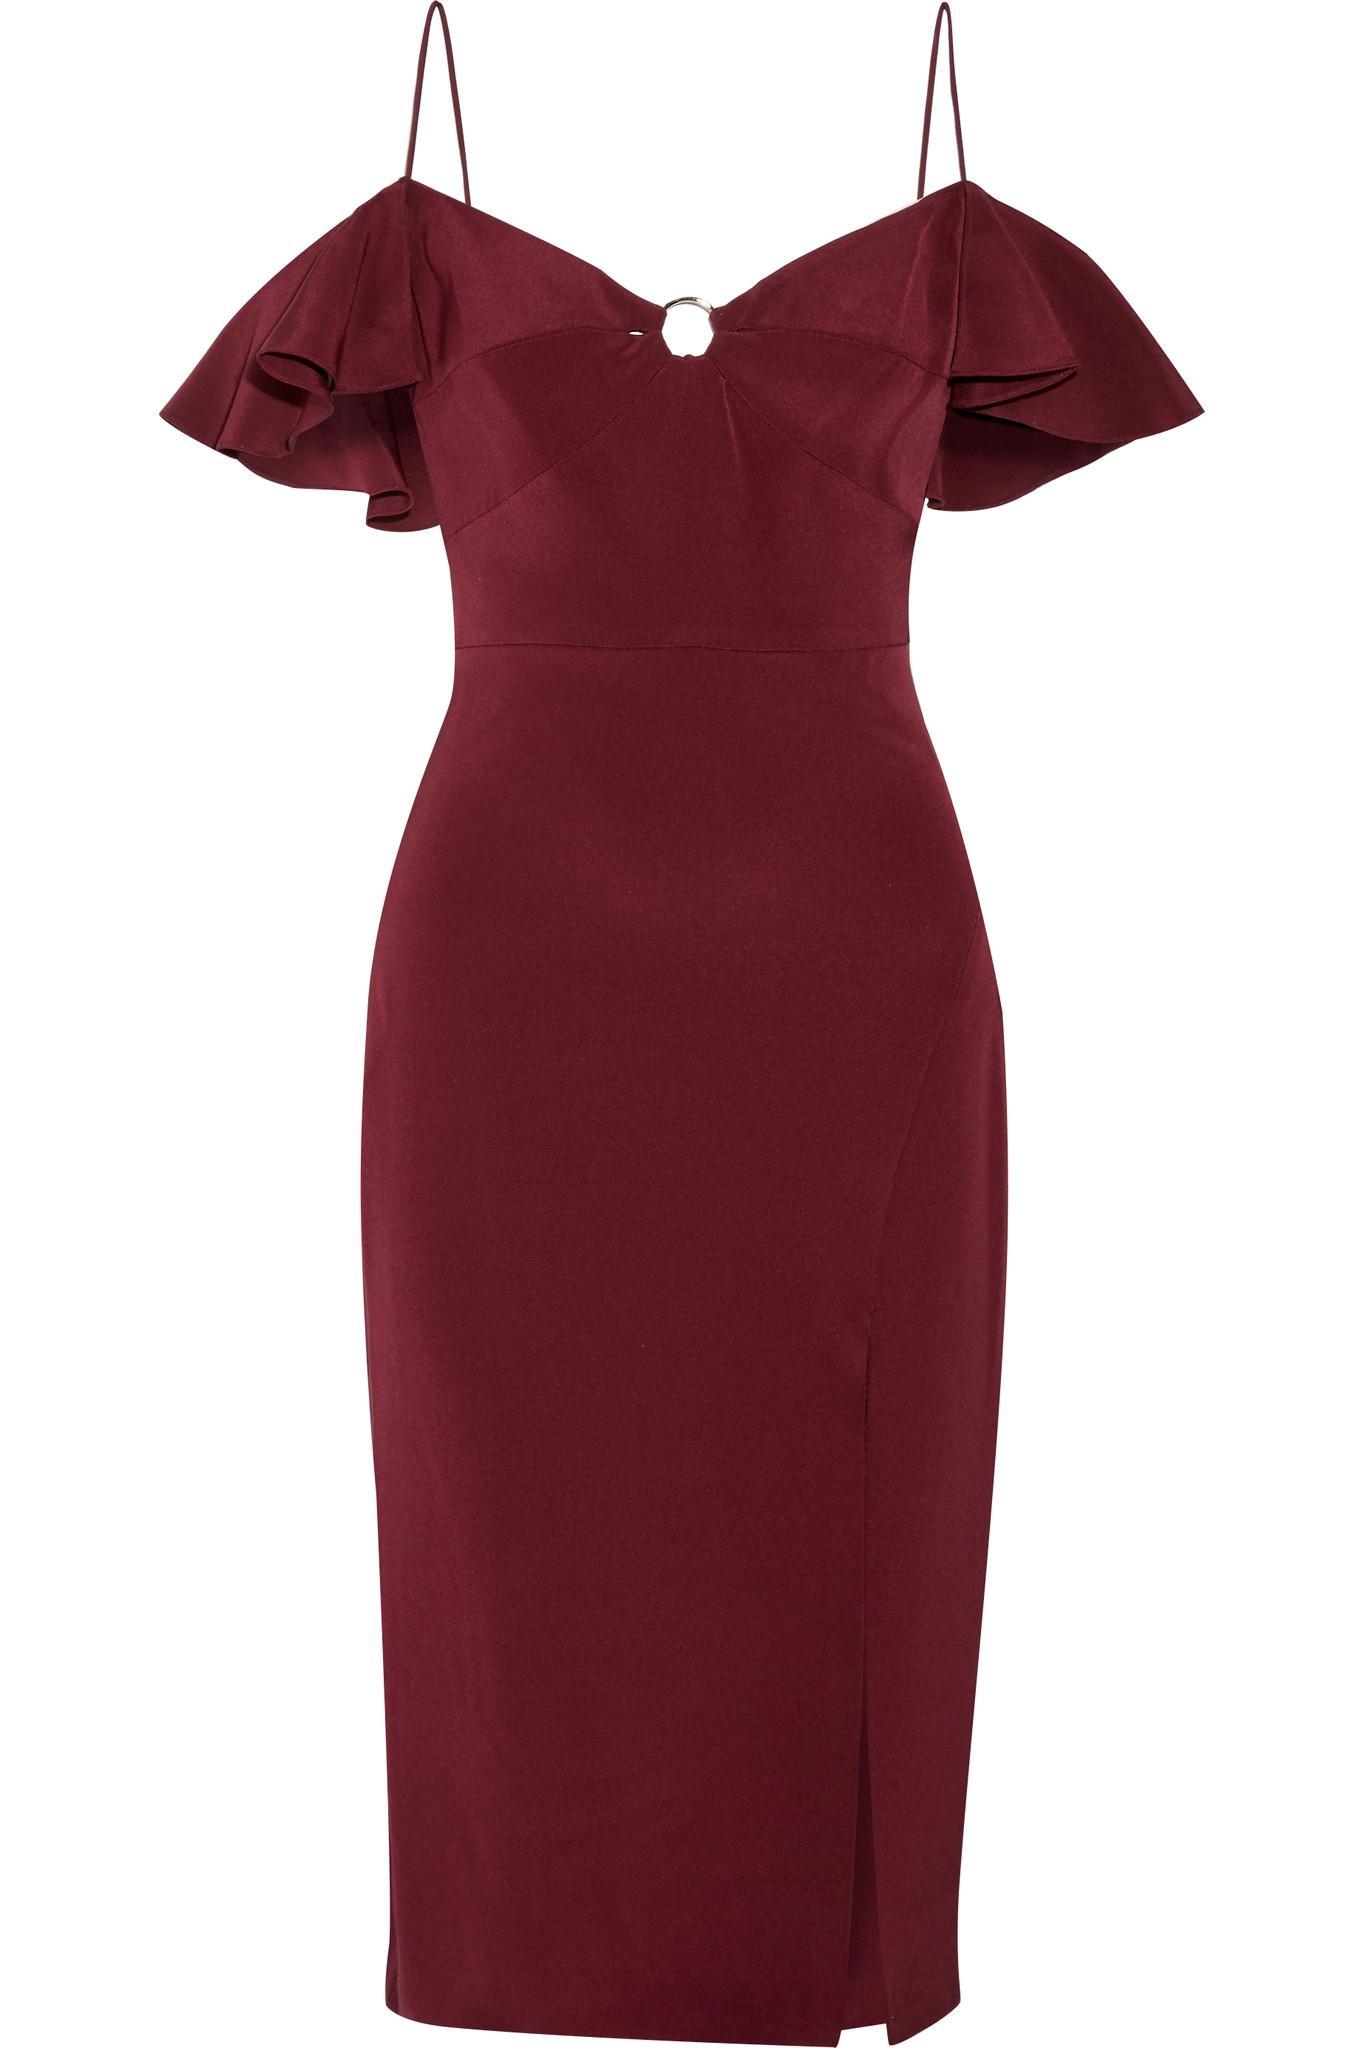 Blake Cold-shoulder Silk-georgette Dress - Merlot Cushnie et Ochs 6d9EjR6X